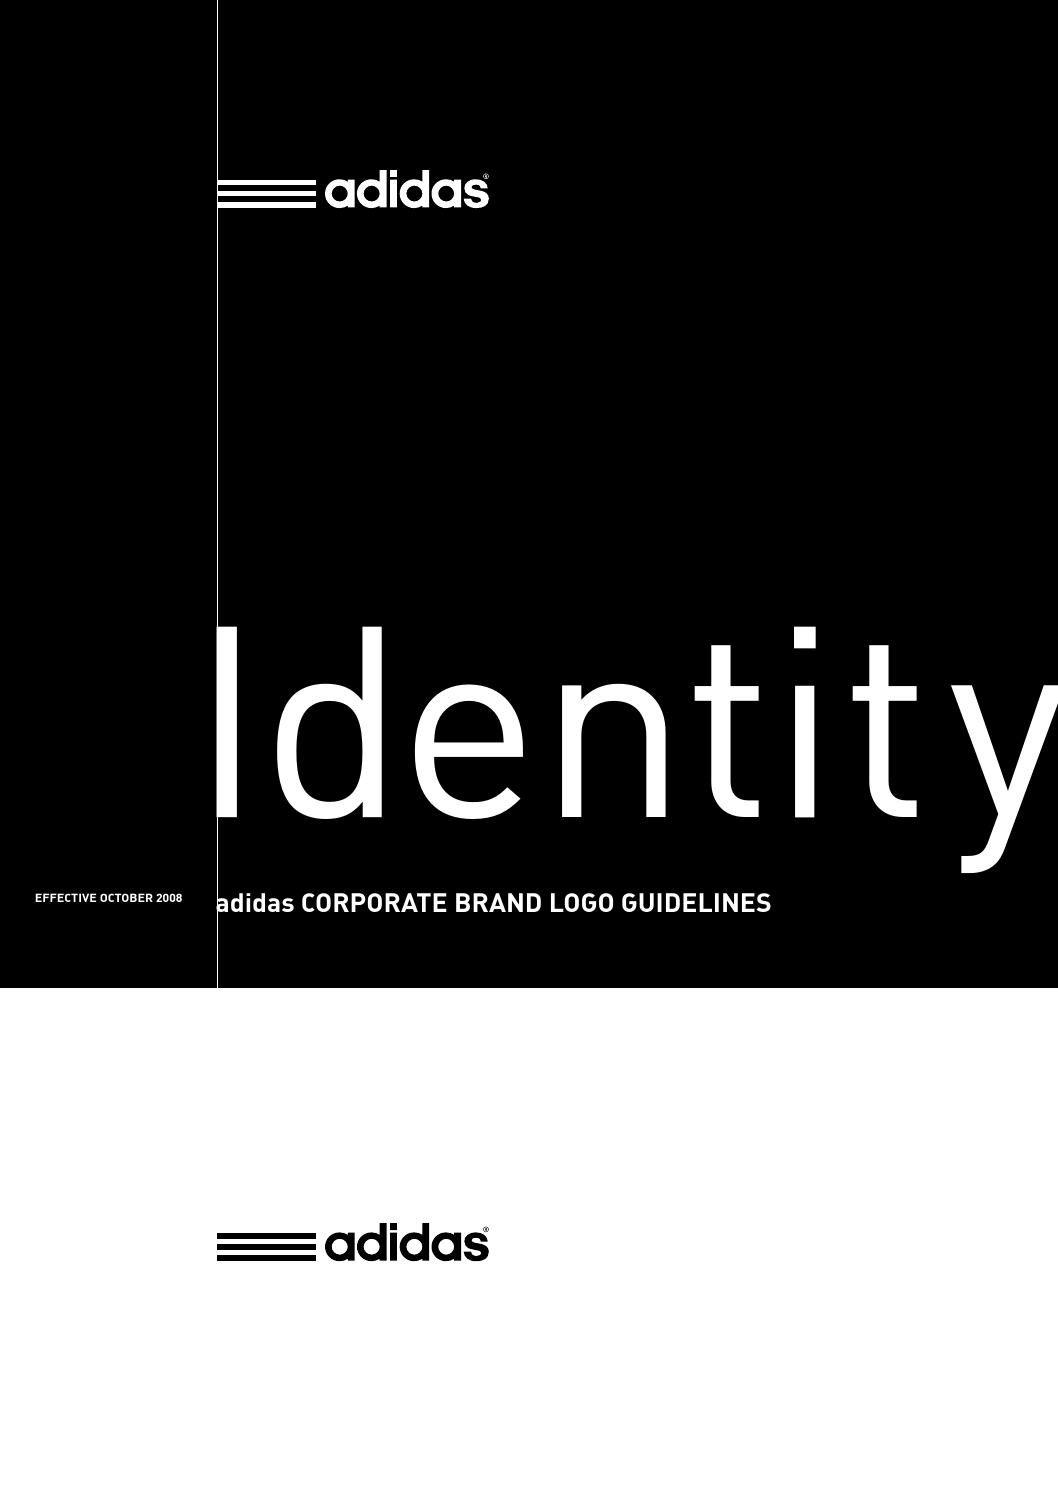 adidas identity styleguides pinterest brand guidelines brand rh pinterest com Color Brand Identity Guide Fashion Brand Identity Guide